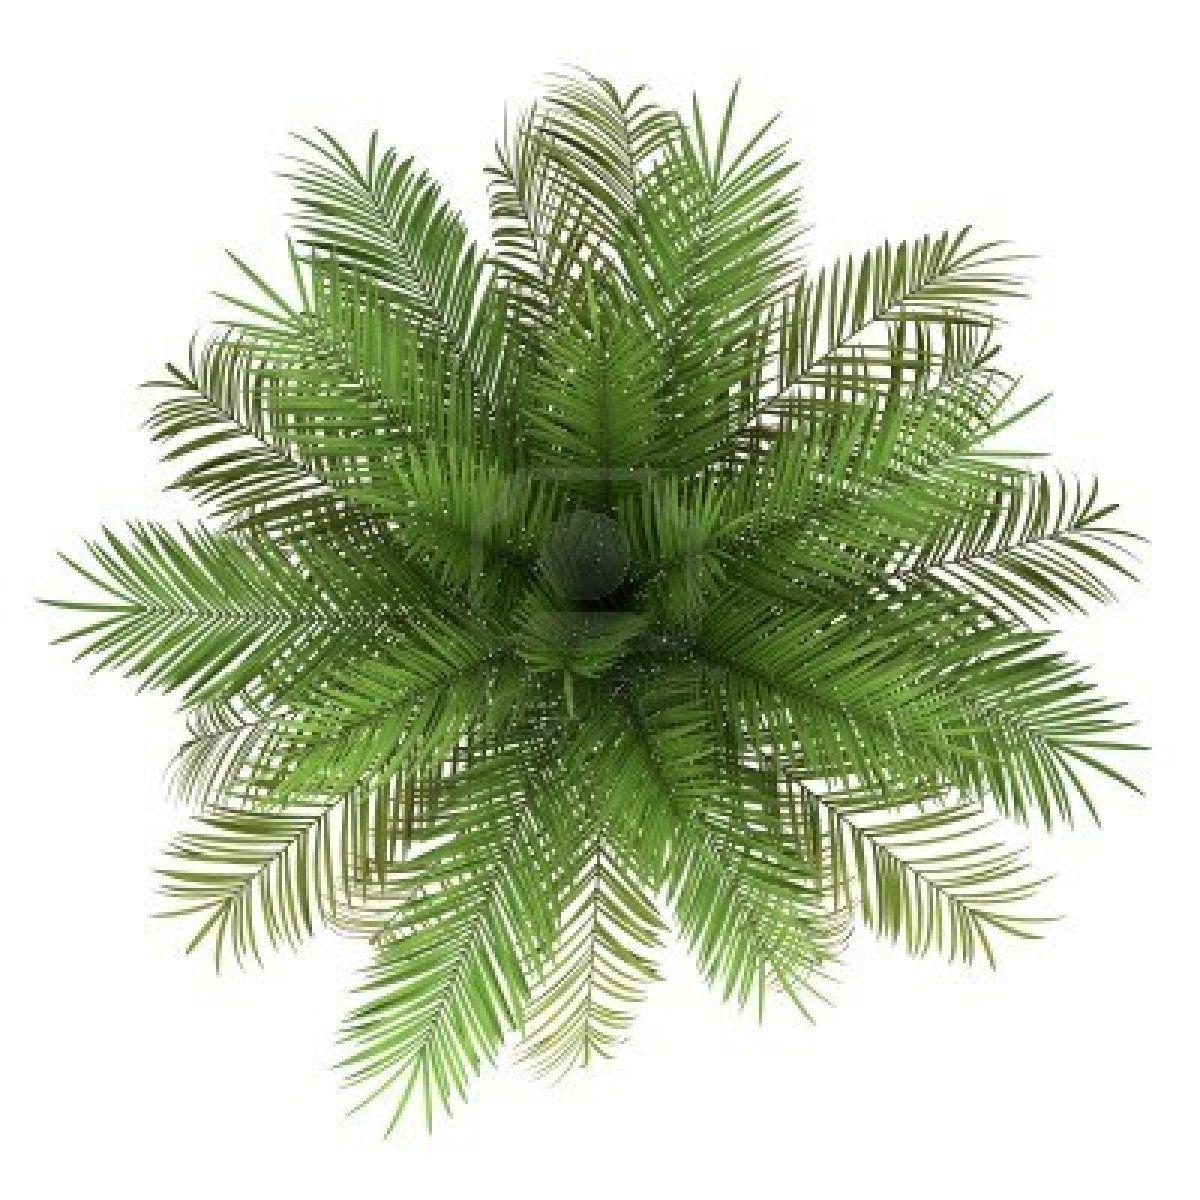 fern top view - Szukaj w Google | Plants inspiration | Pinterest | Fern for Palm Tree Top View Png  54lyp